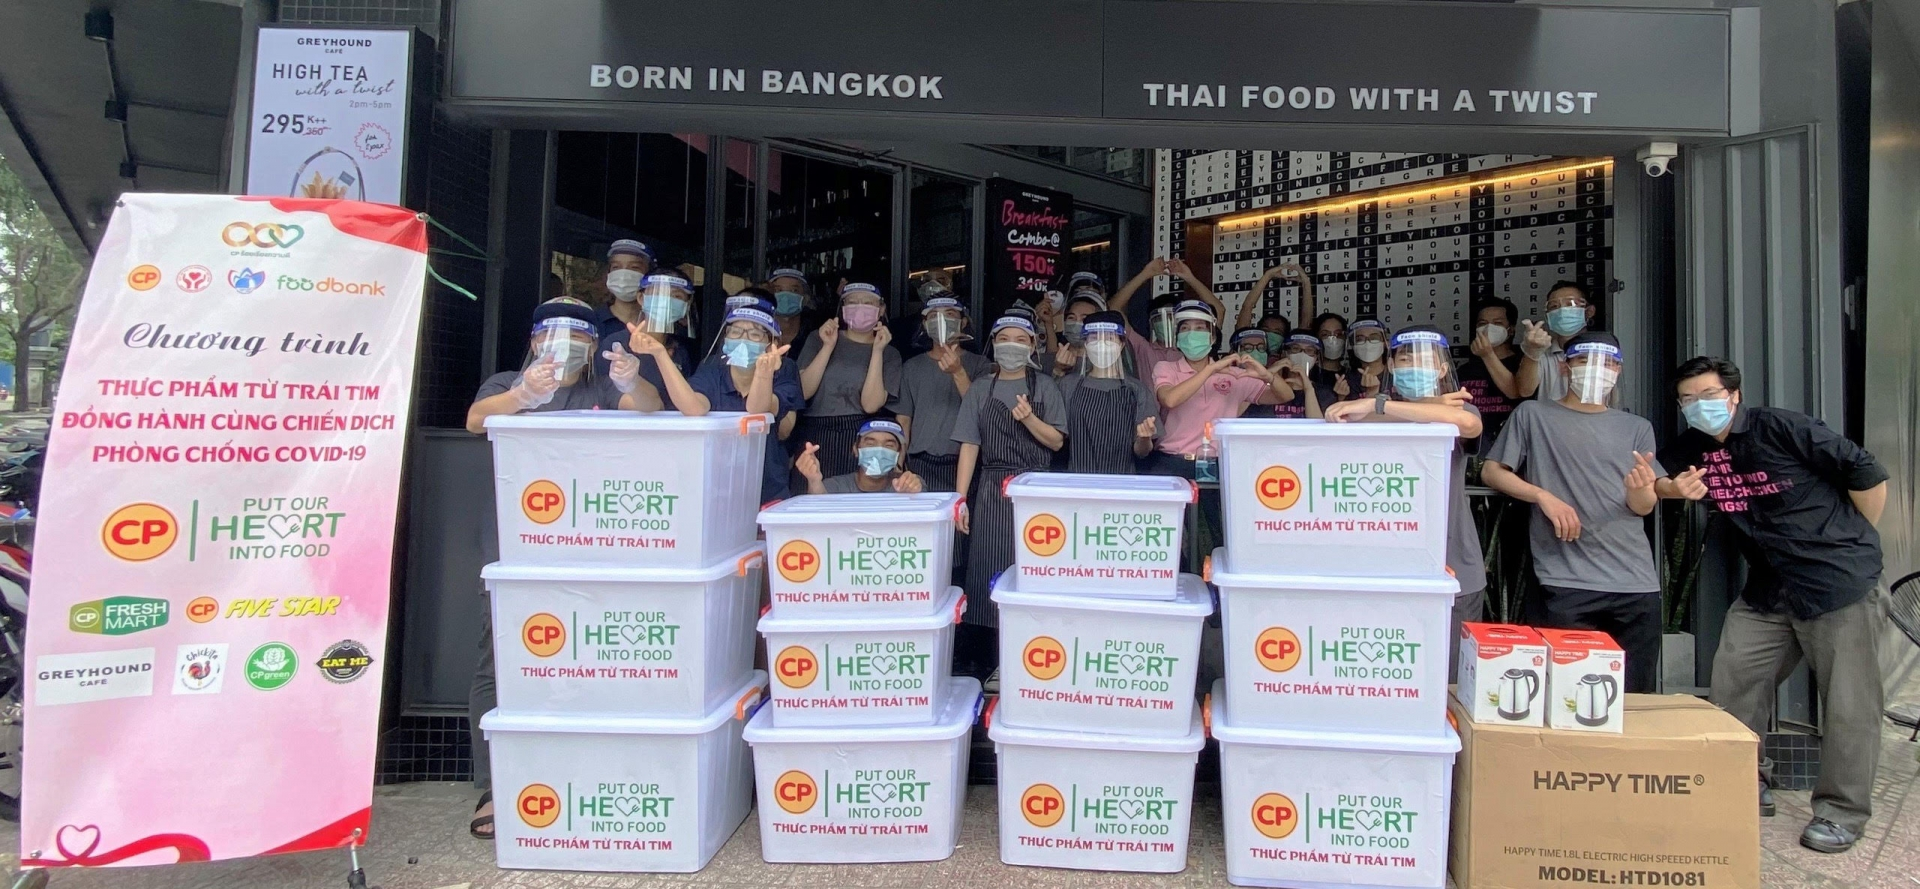 C.P. Vietnam prepares heartfelt donations of food to support pandemic effort